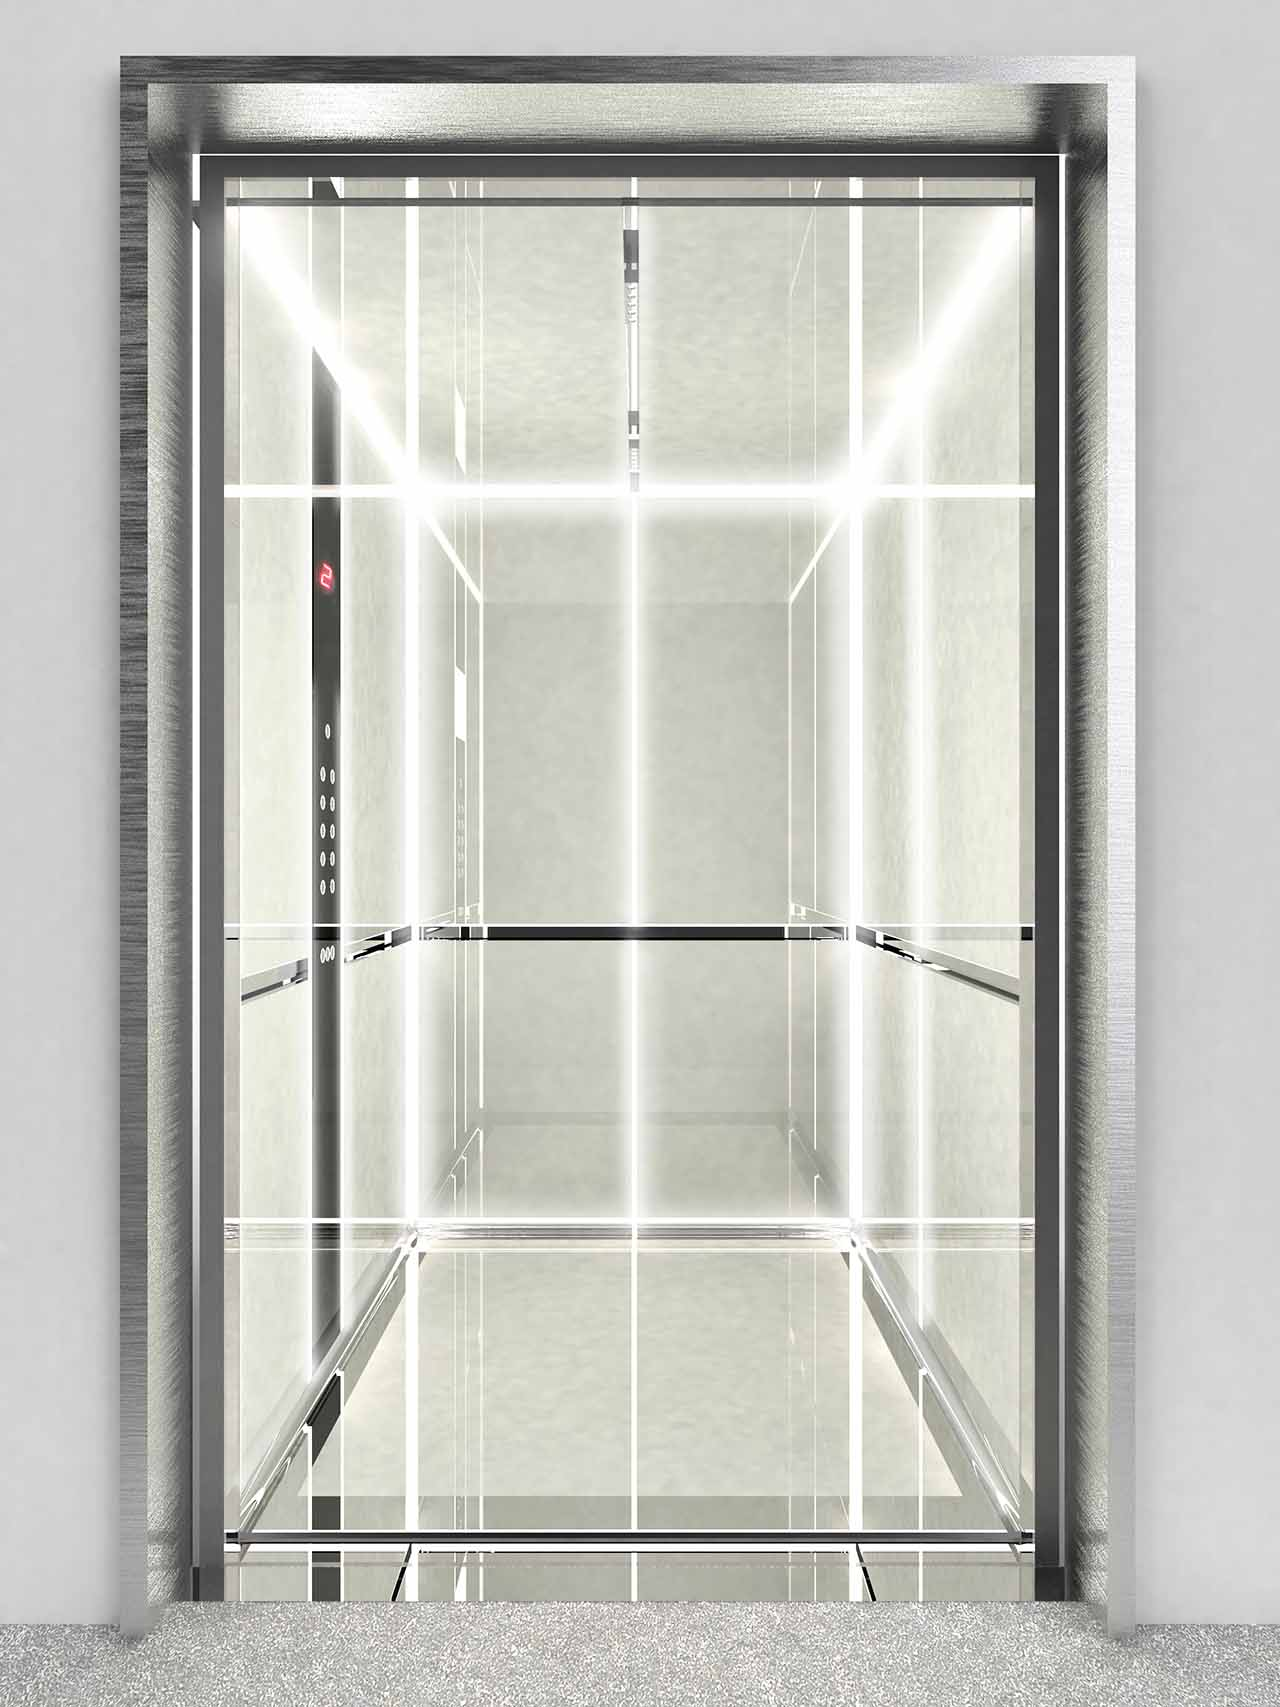 La trasparenza del rivestimento in vetro